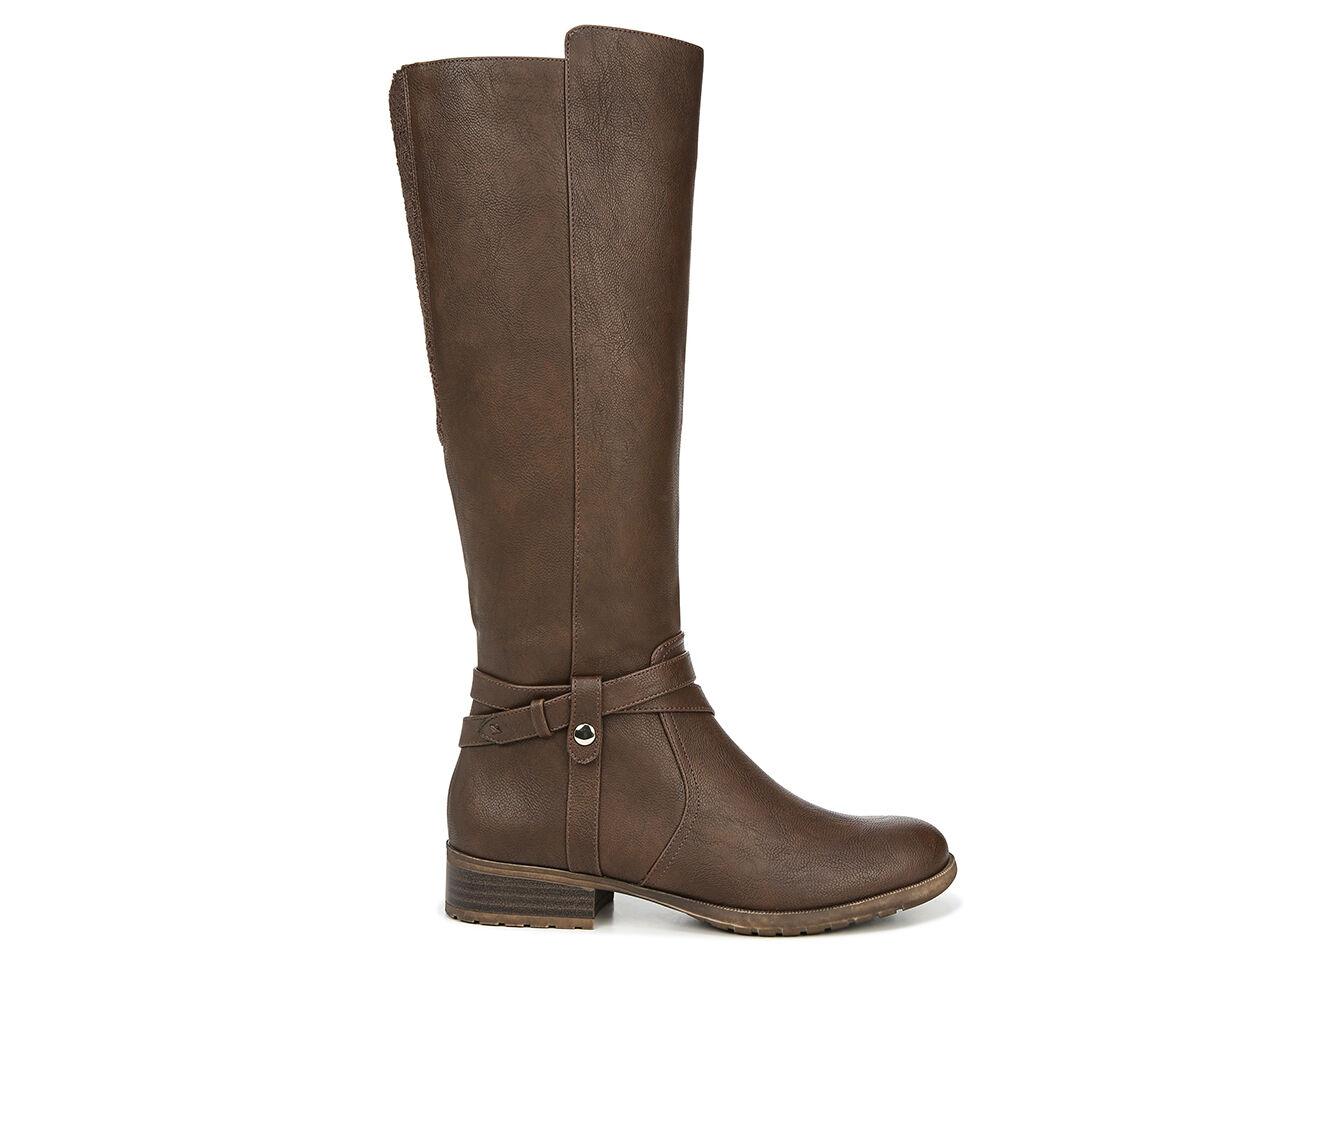 Buy Popular Women's LifeStride Xtrovert Wide Calf Riding Boots Dark Tan